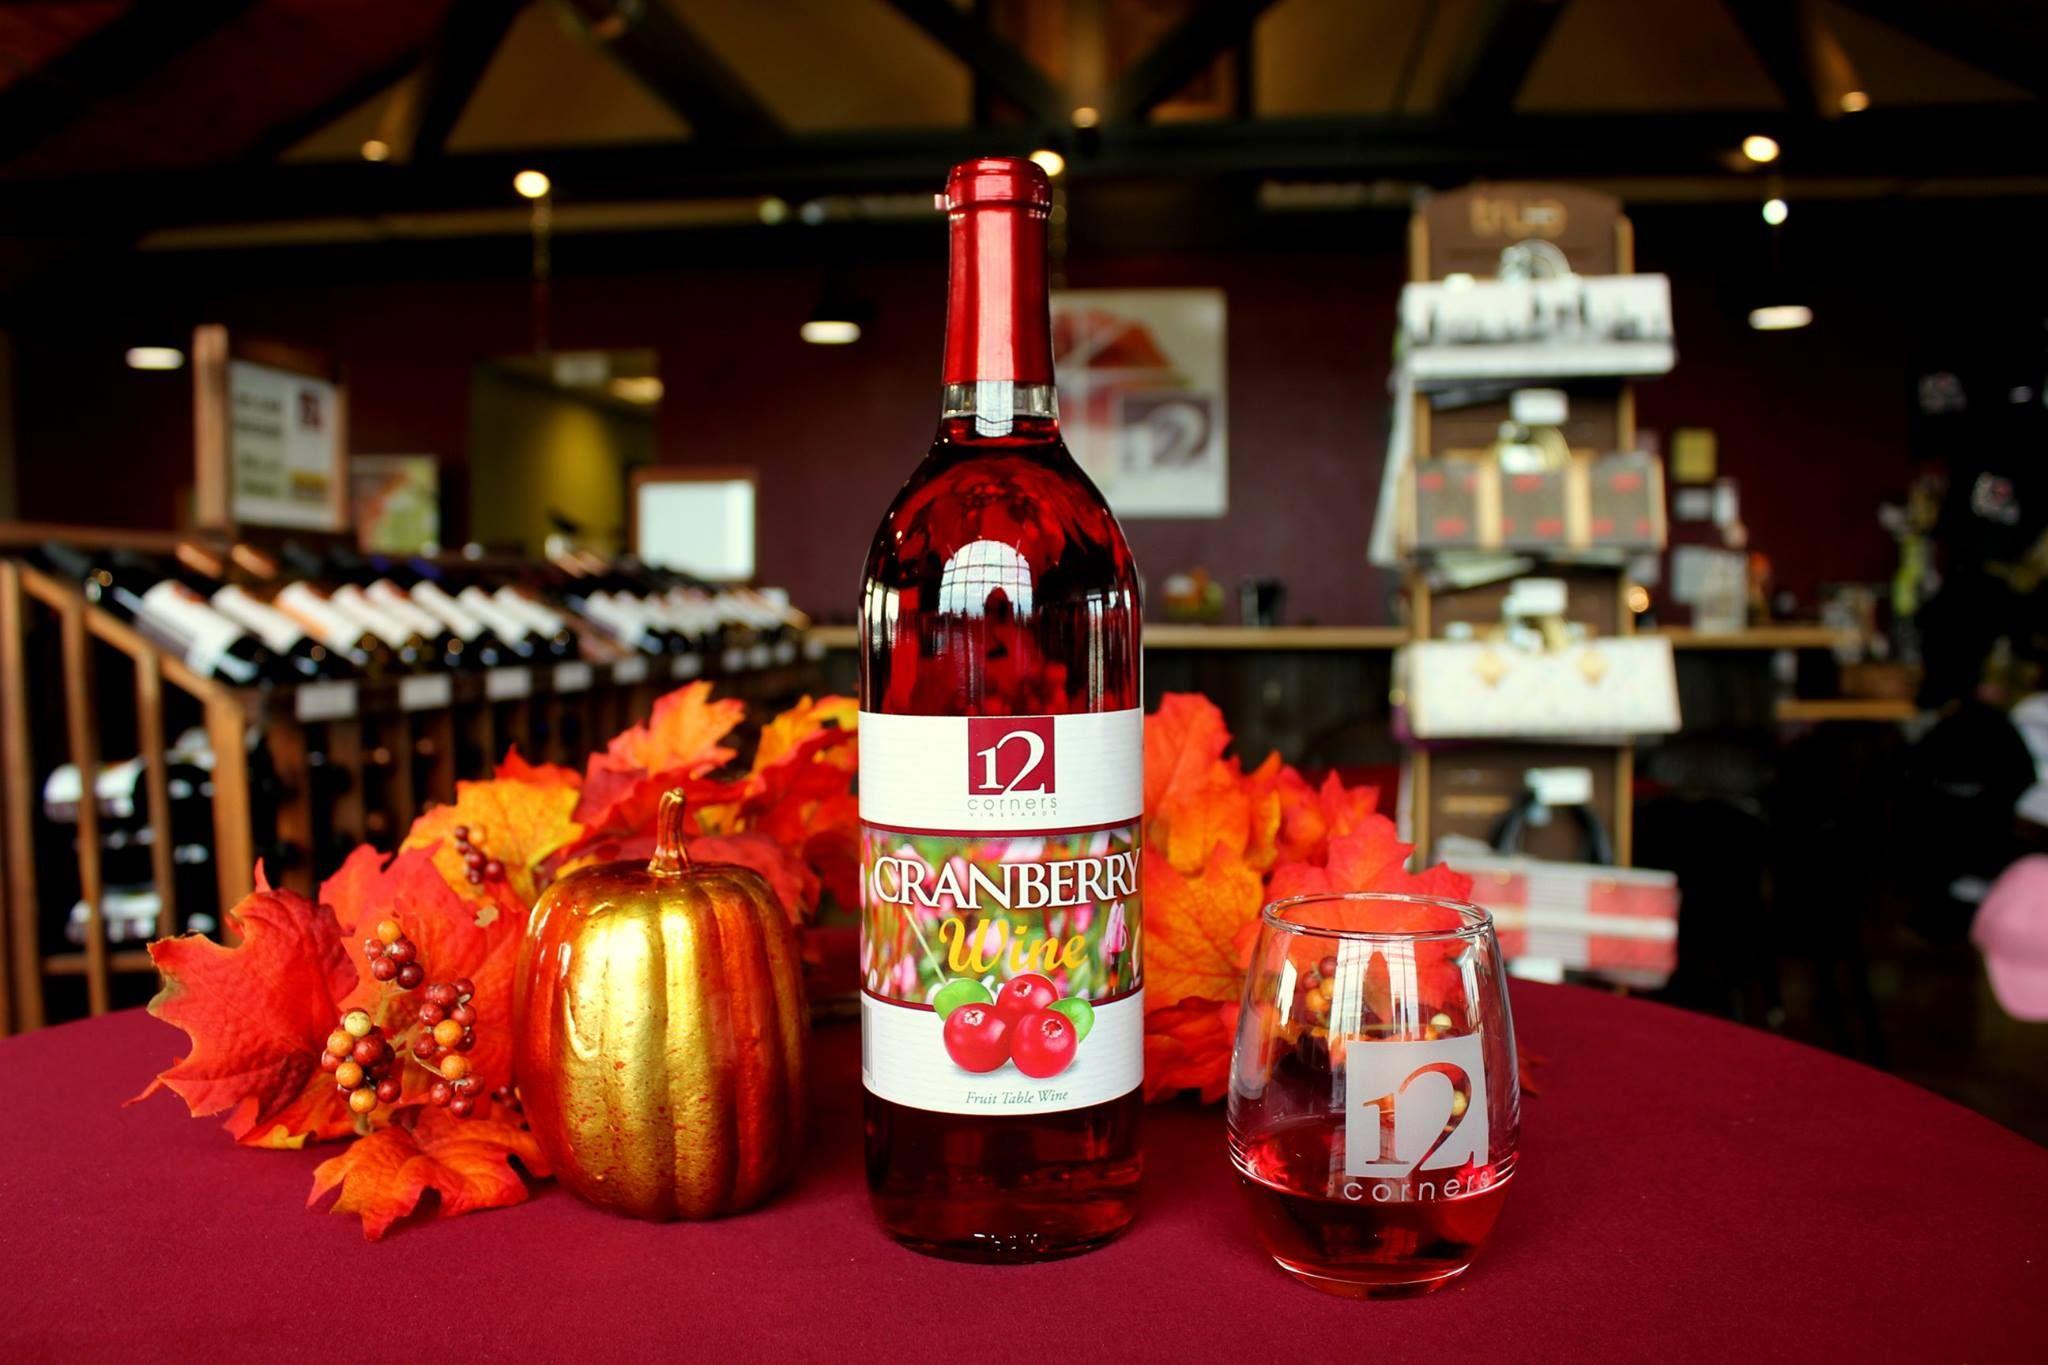 12 Corners Michigan Winery Tasting Room Very Nice With Pouring Samples Winery Tasting Room Tasting Room Cranberry